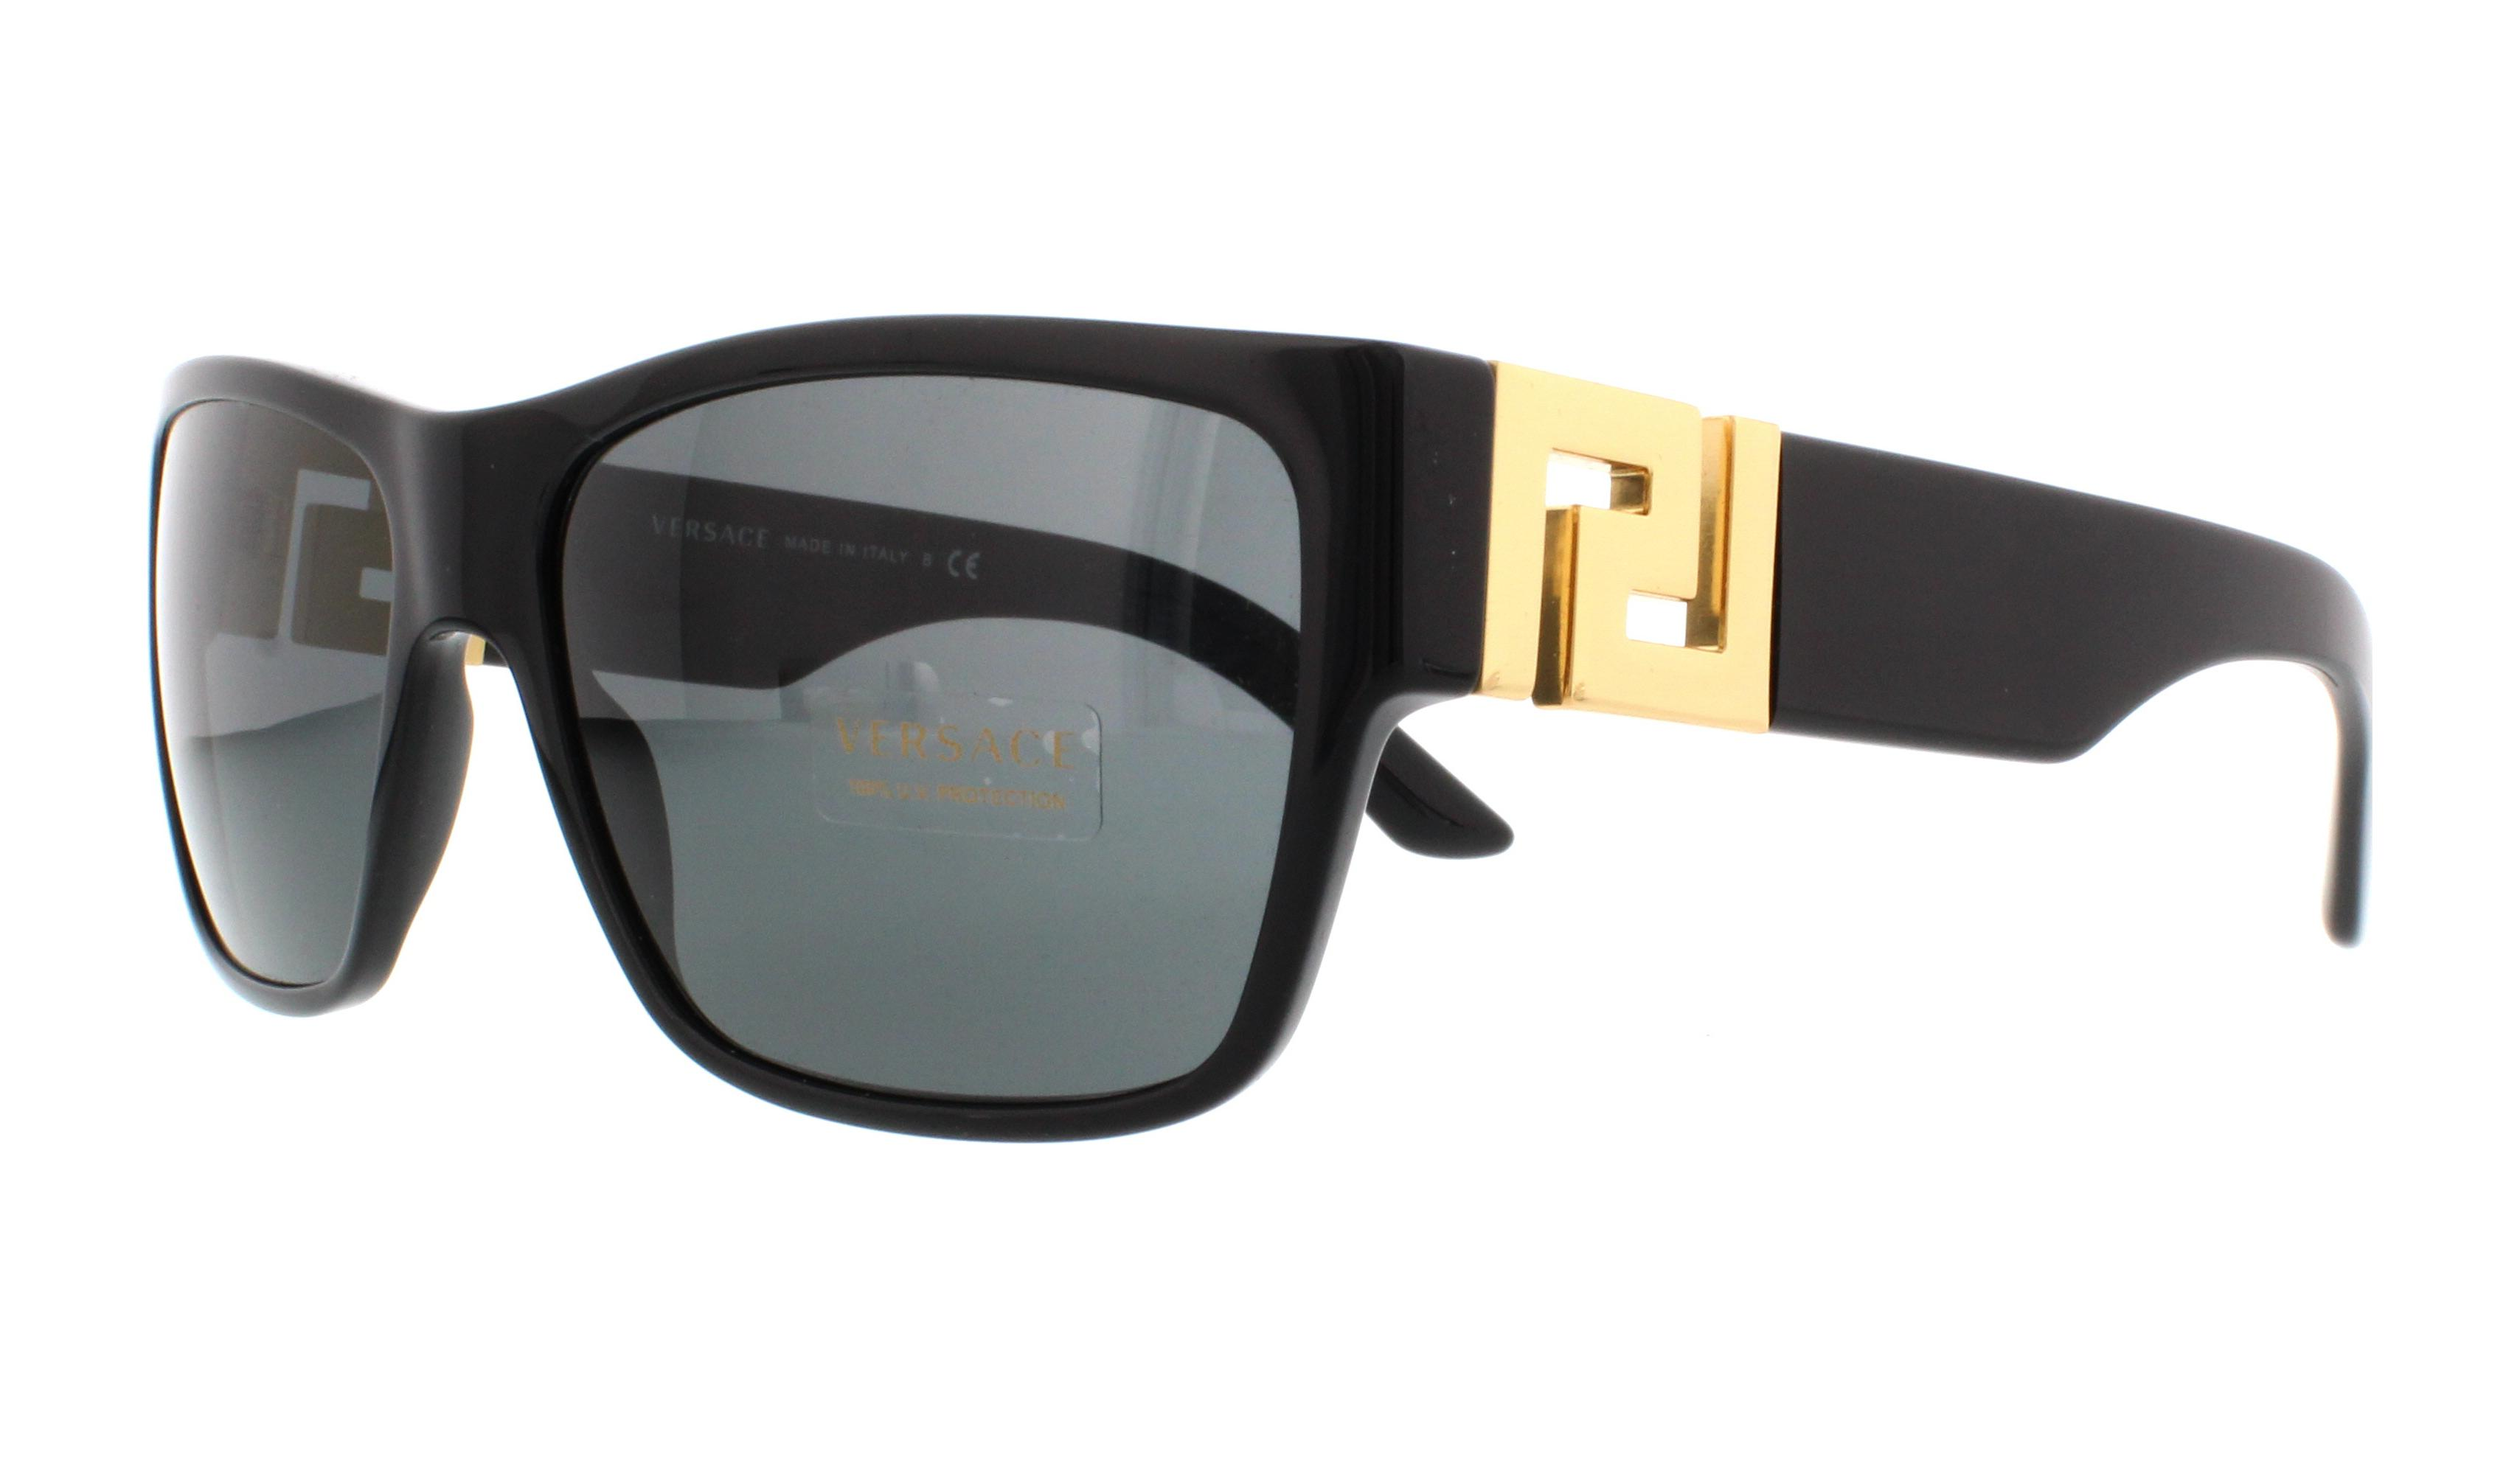 GB1/87 Black